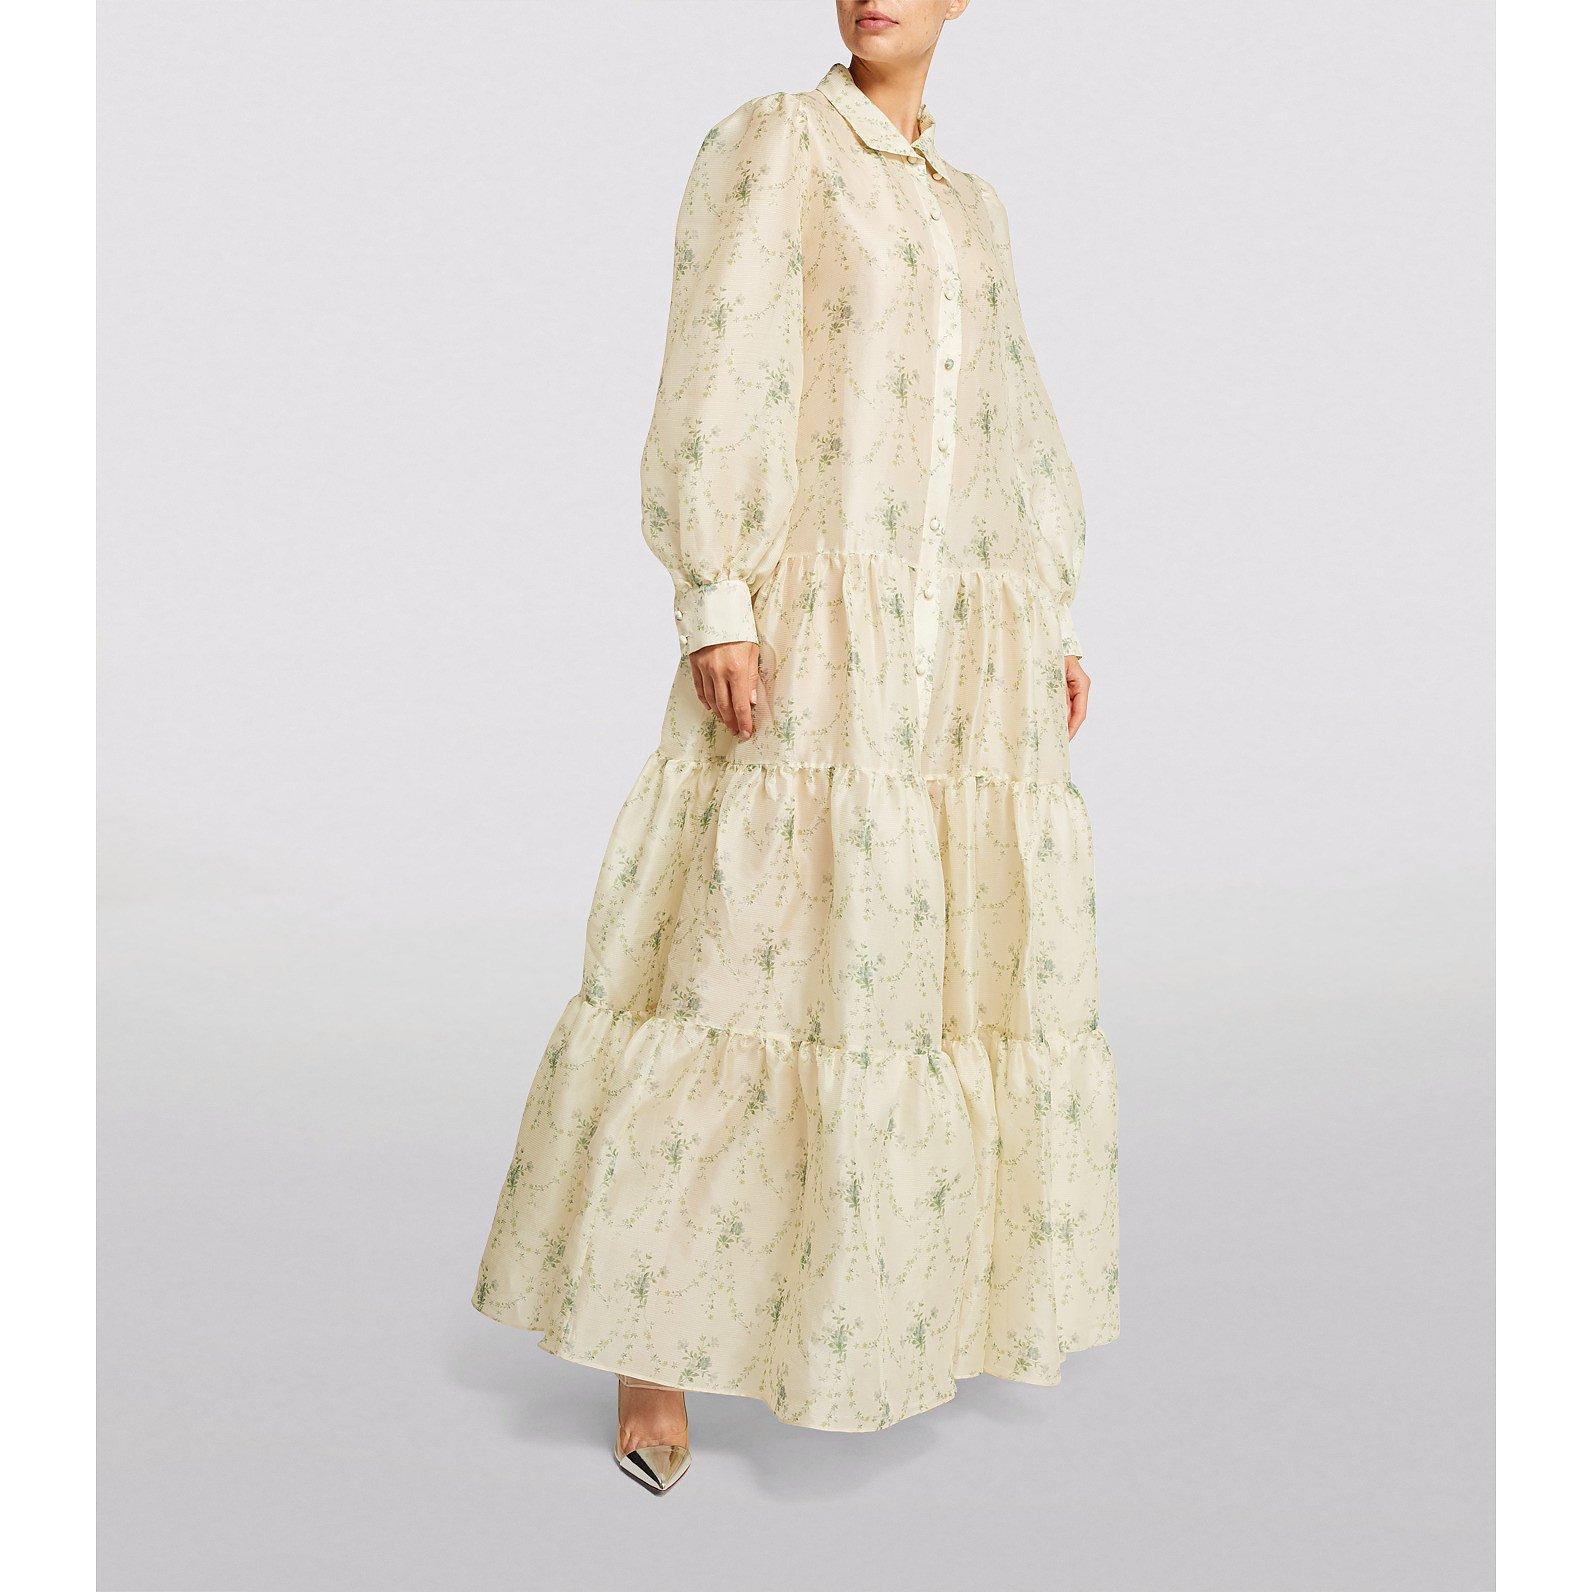 Brock Collection Tiered Silk Queenesta Maxi Dress